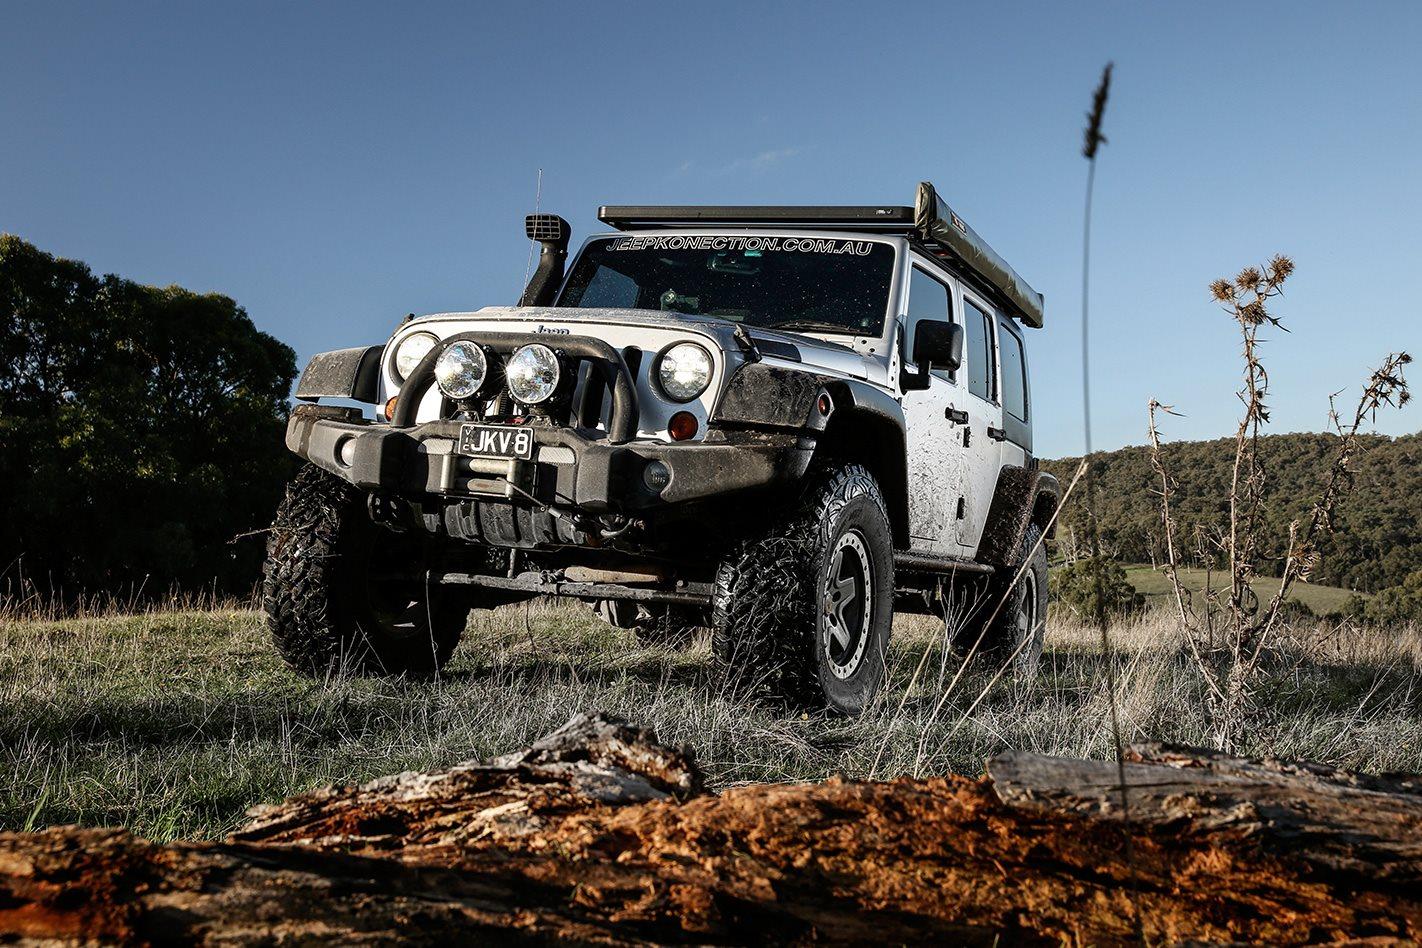 Jeep Wrangler Jk V8 Hemi Put To The Test Wire Harness On Hood